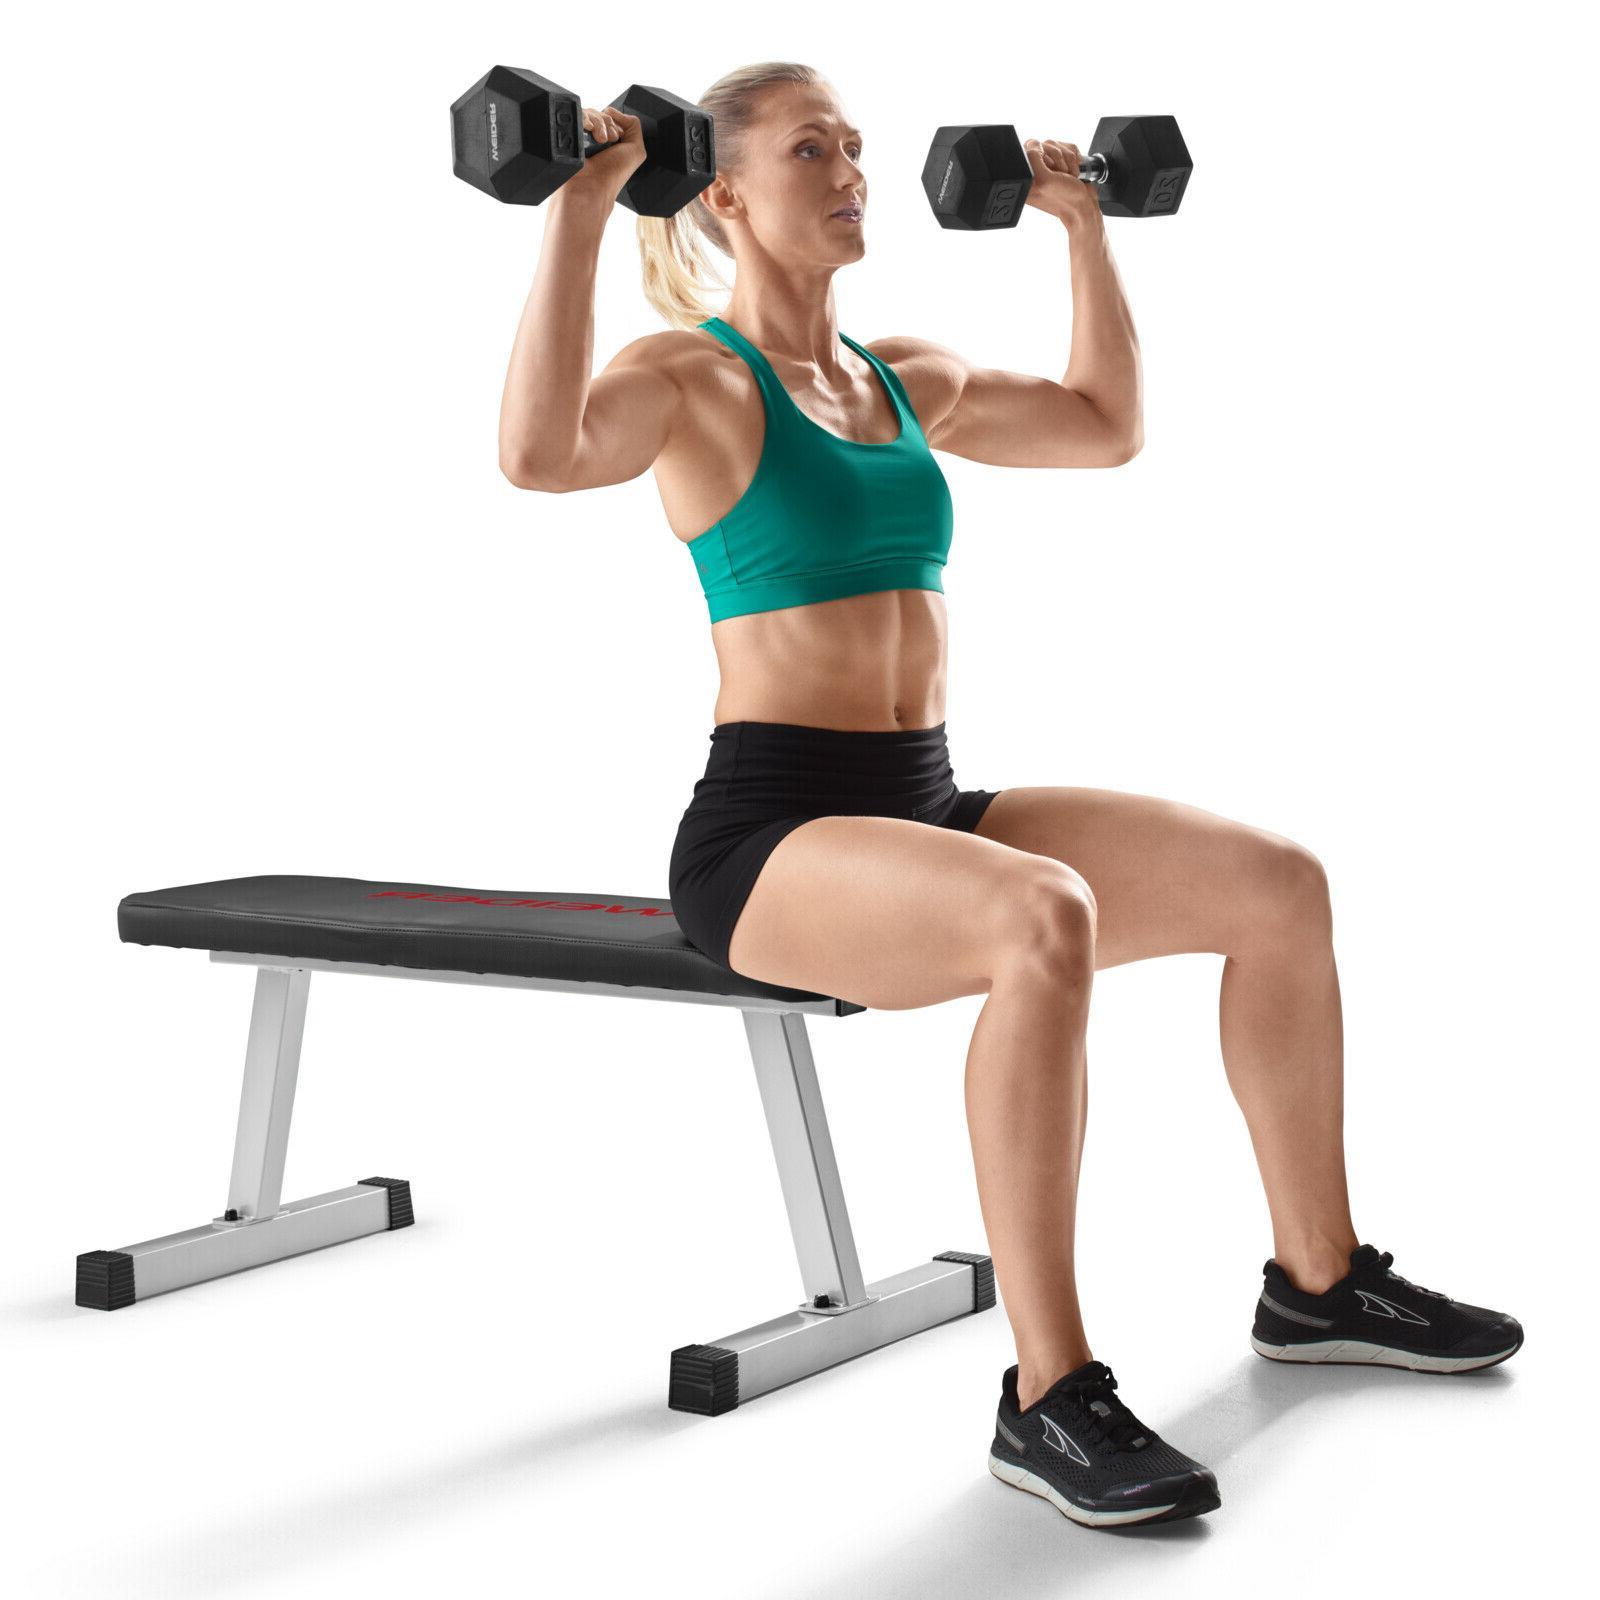 Weider Strength Bench